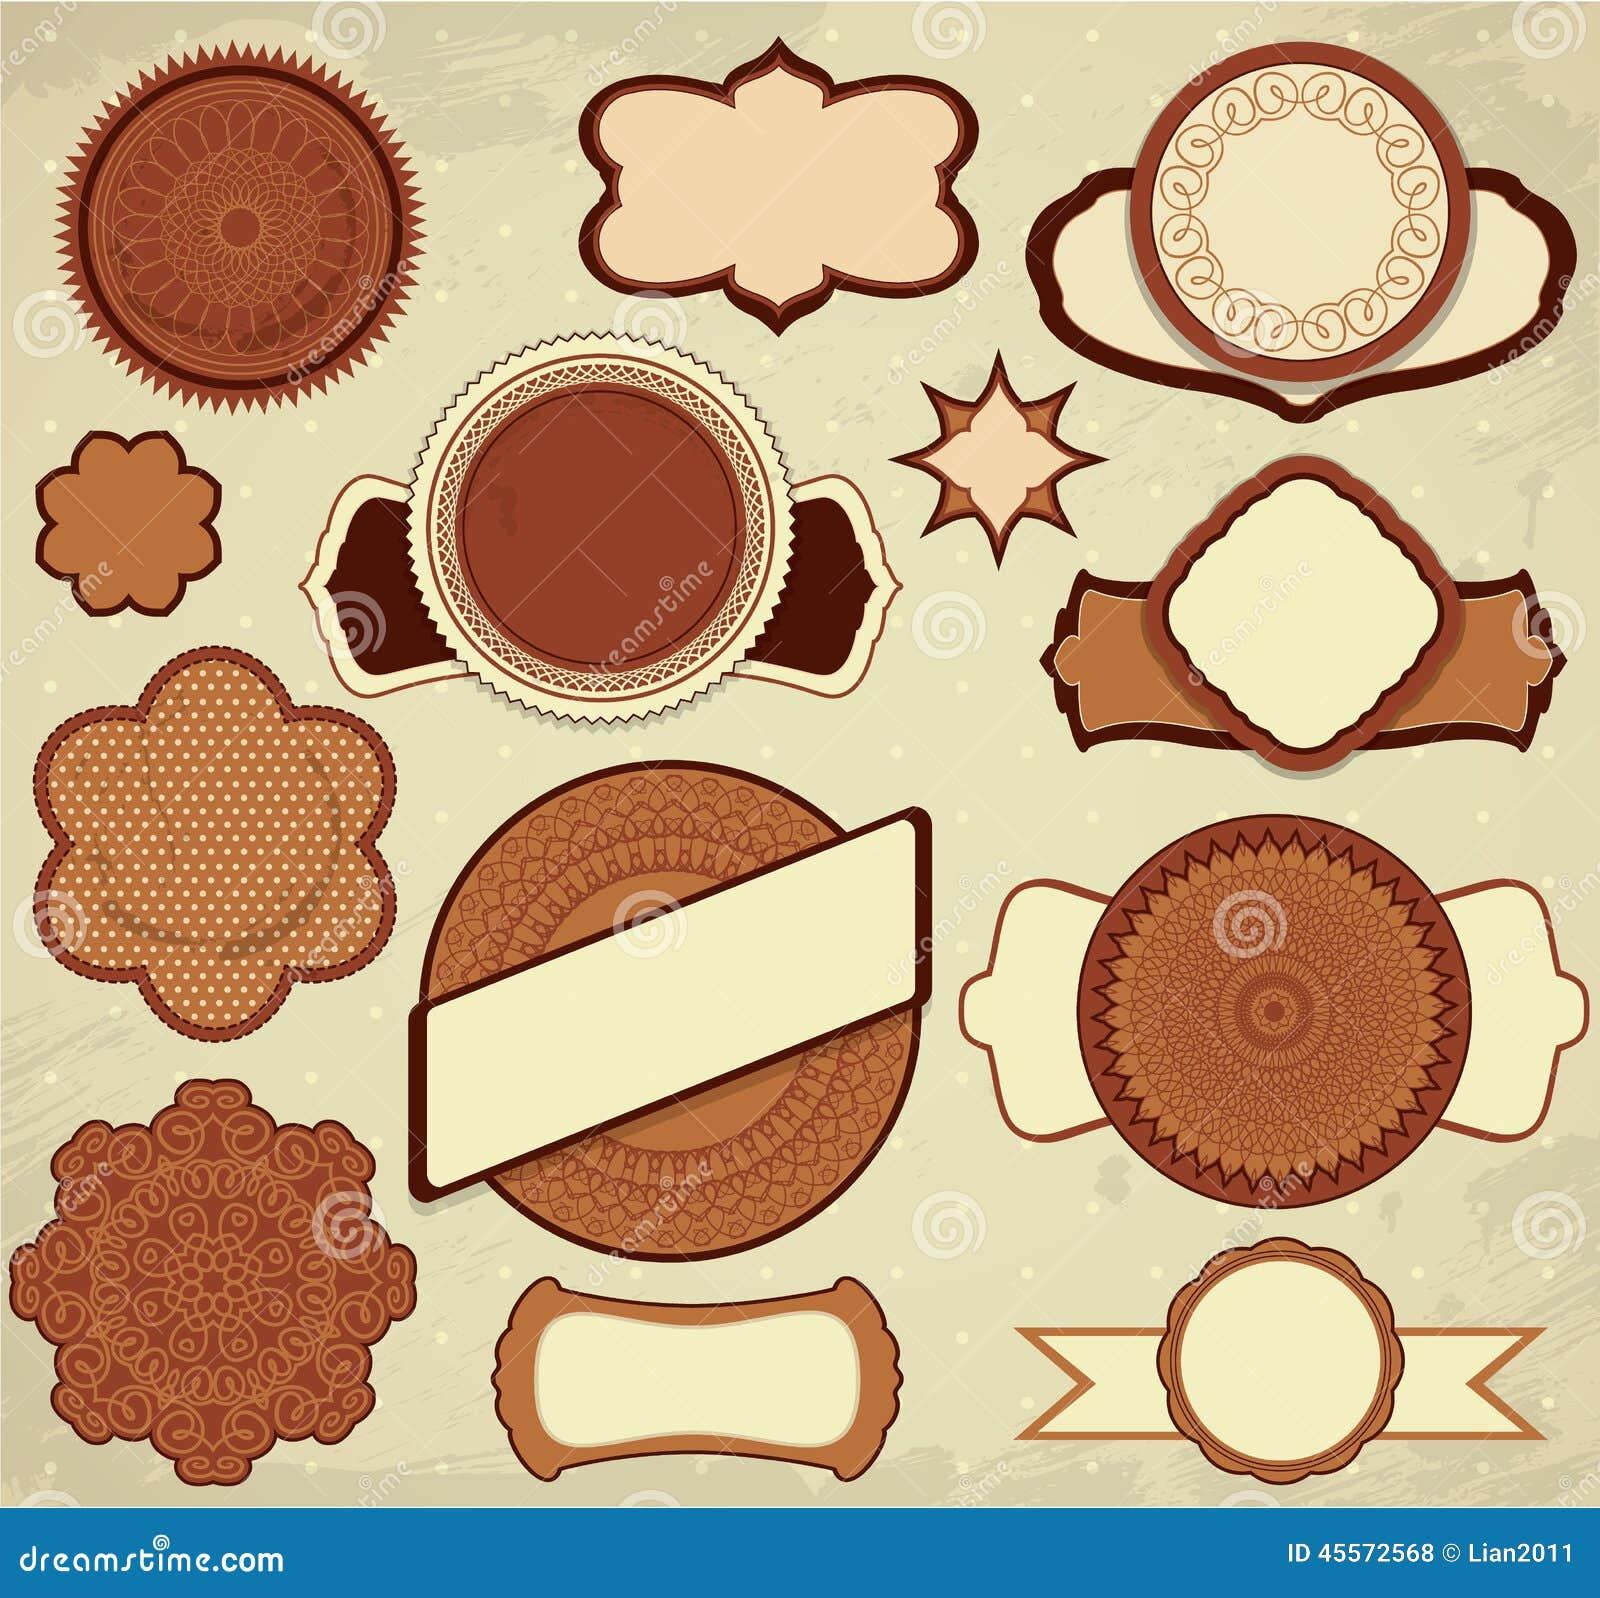 Vintage Ornamental Banner:  Vintage Chocolate Labels Set In Brown And Beige Colors